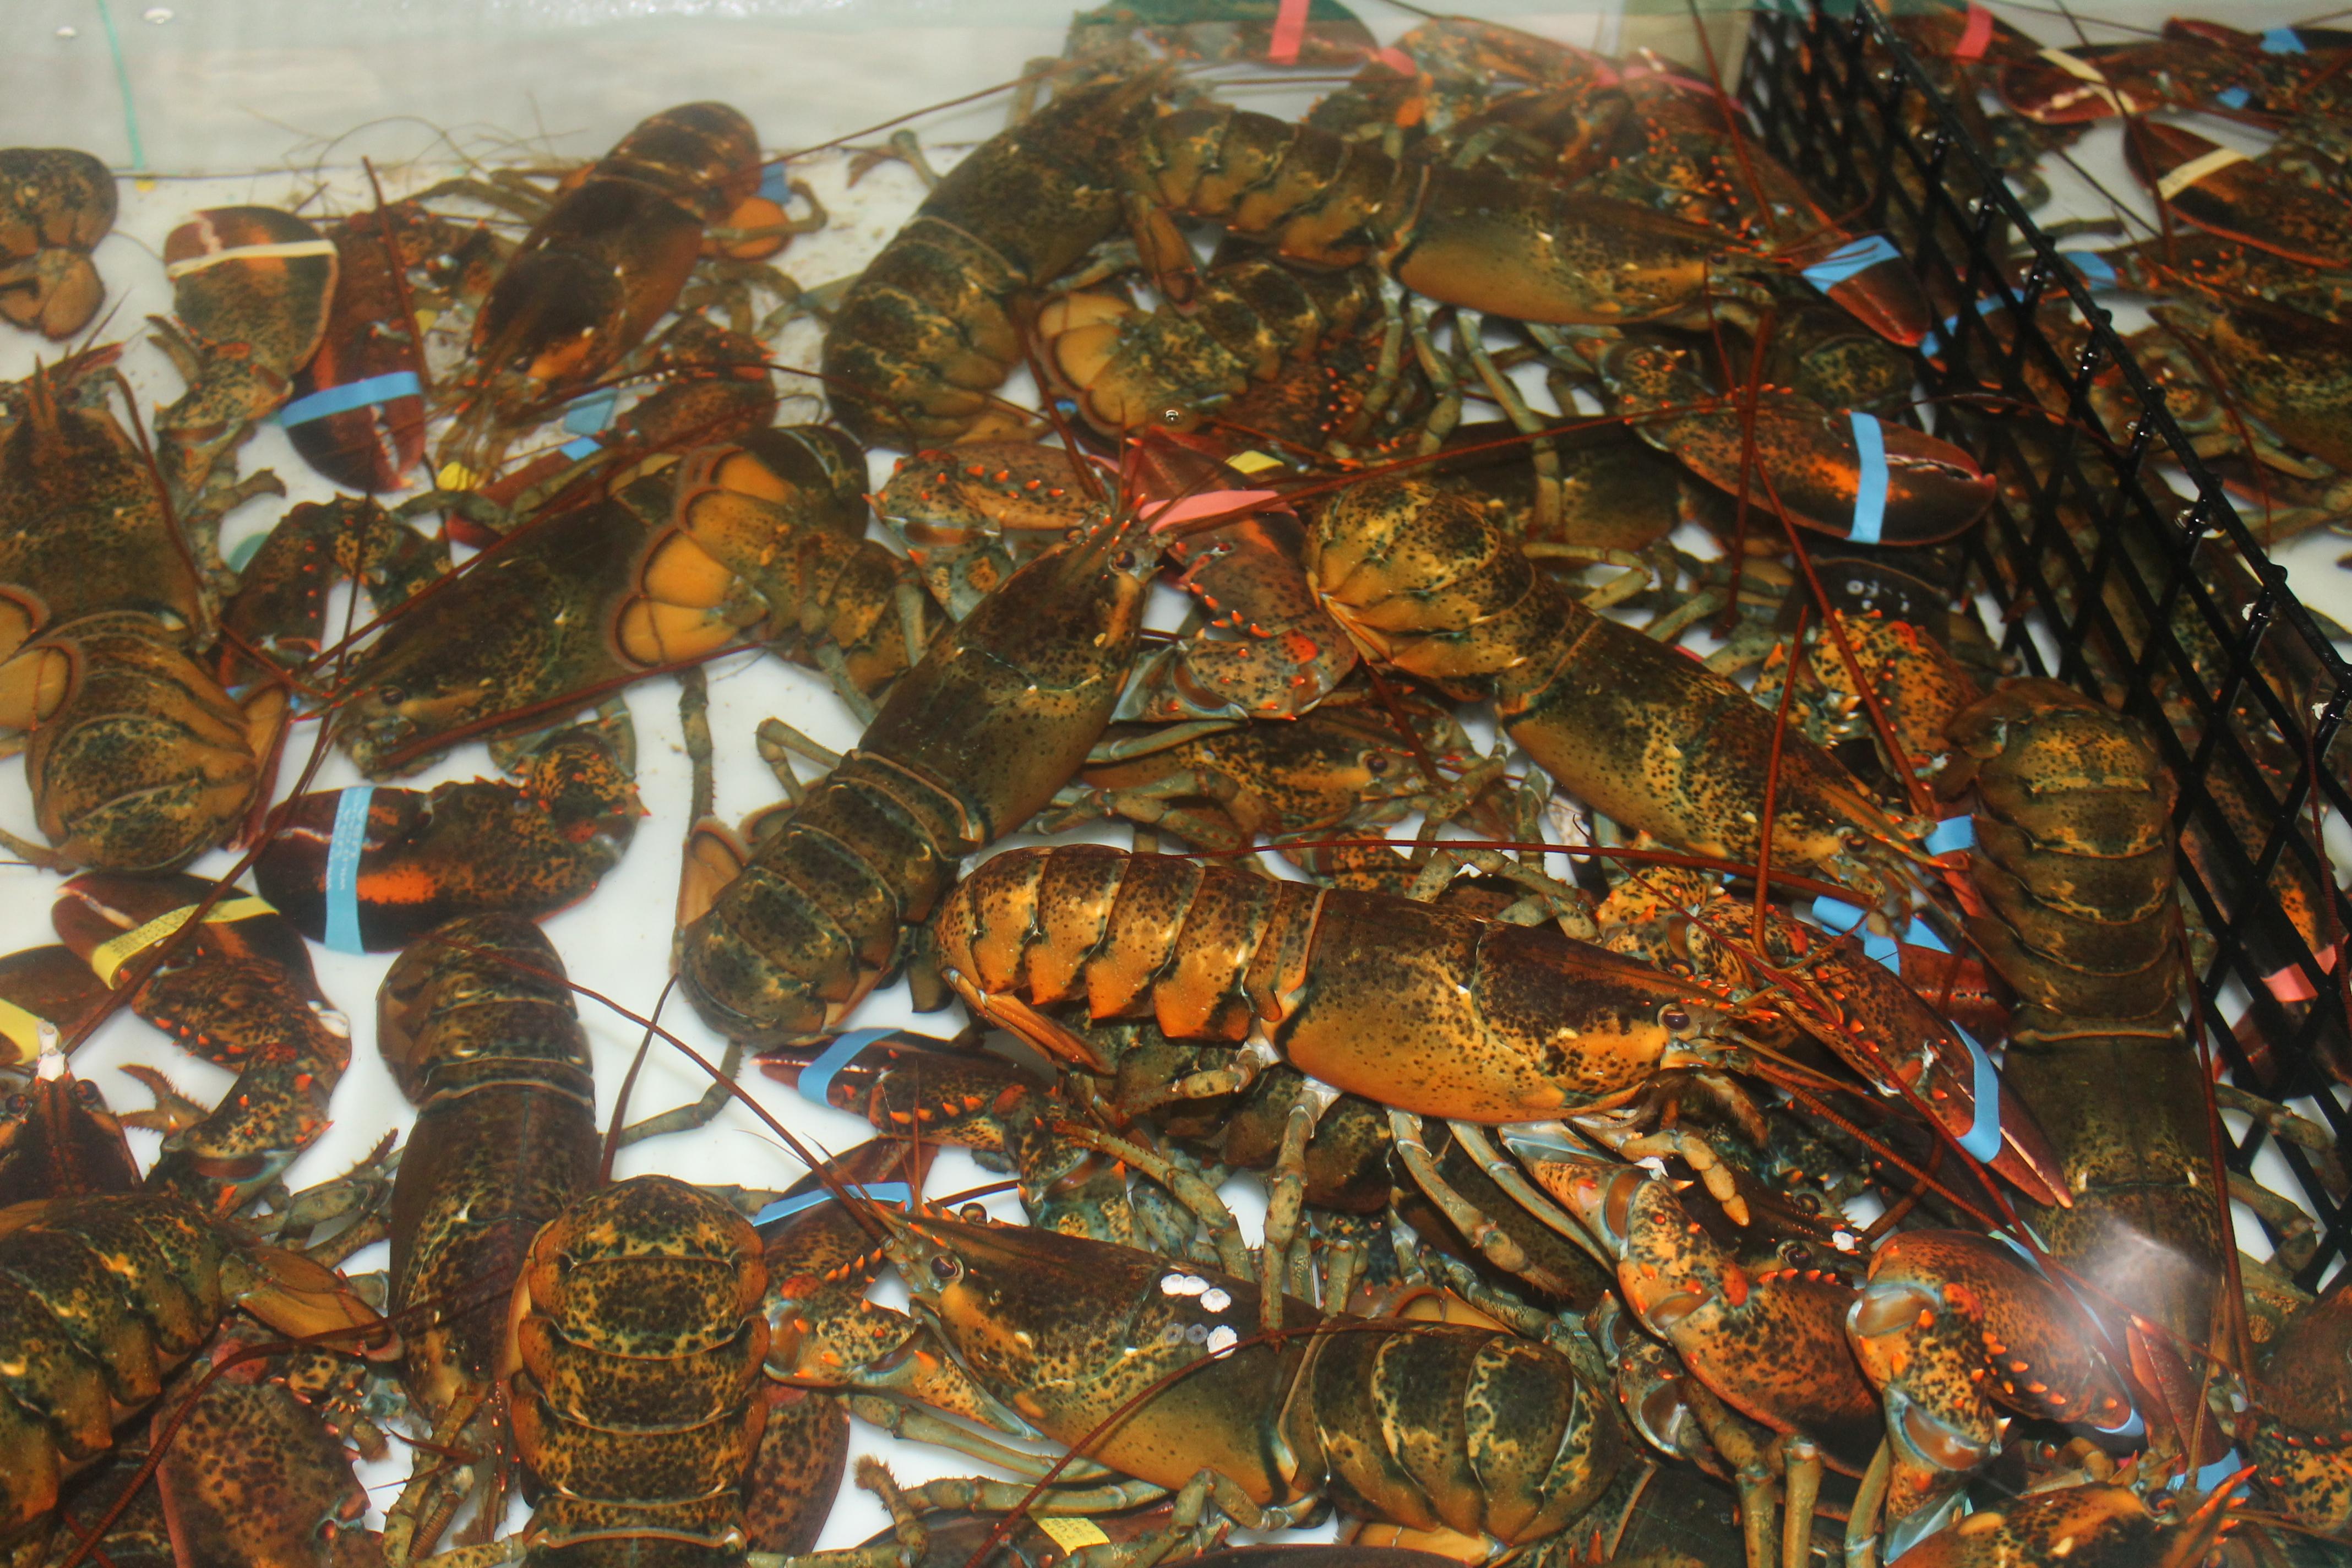 Lobsters awaiting purchase, Trenton, ME IMG 2477.JPG